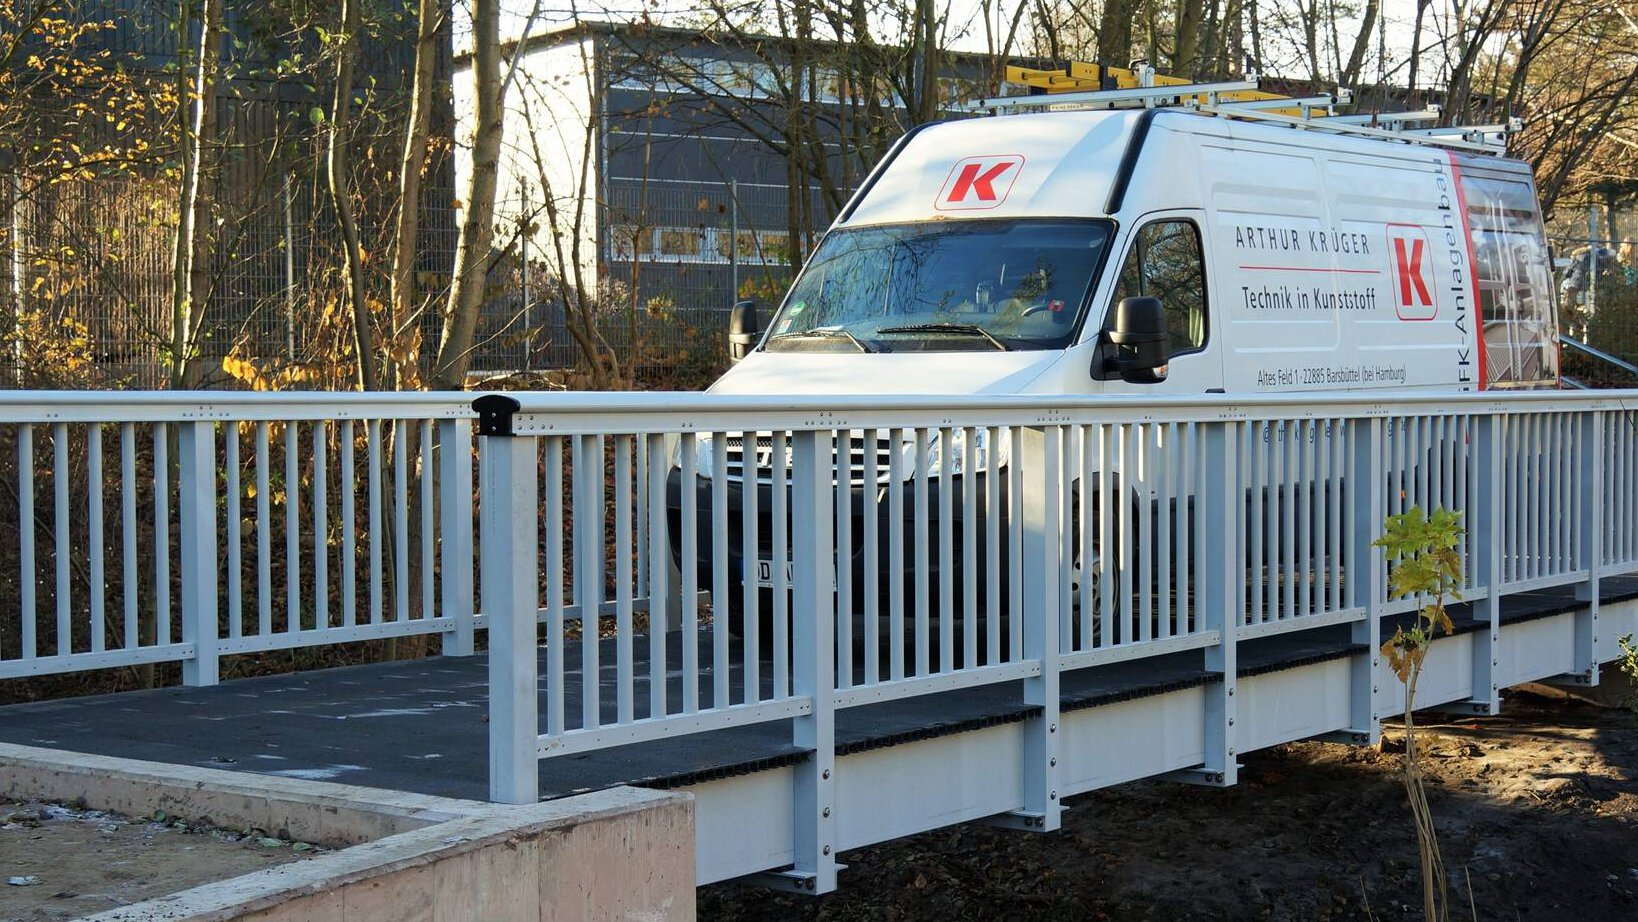 Gallery image 1 - footbridge in a public park